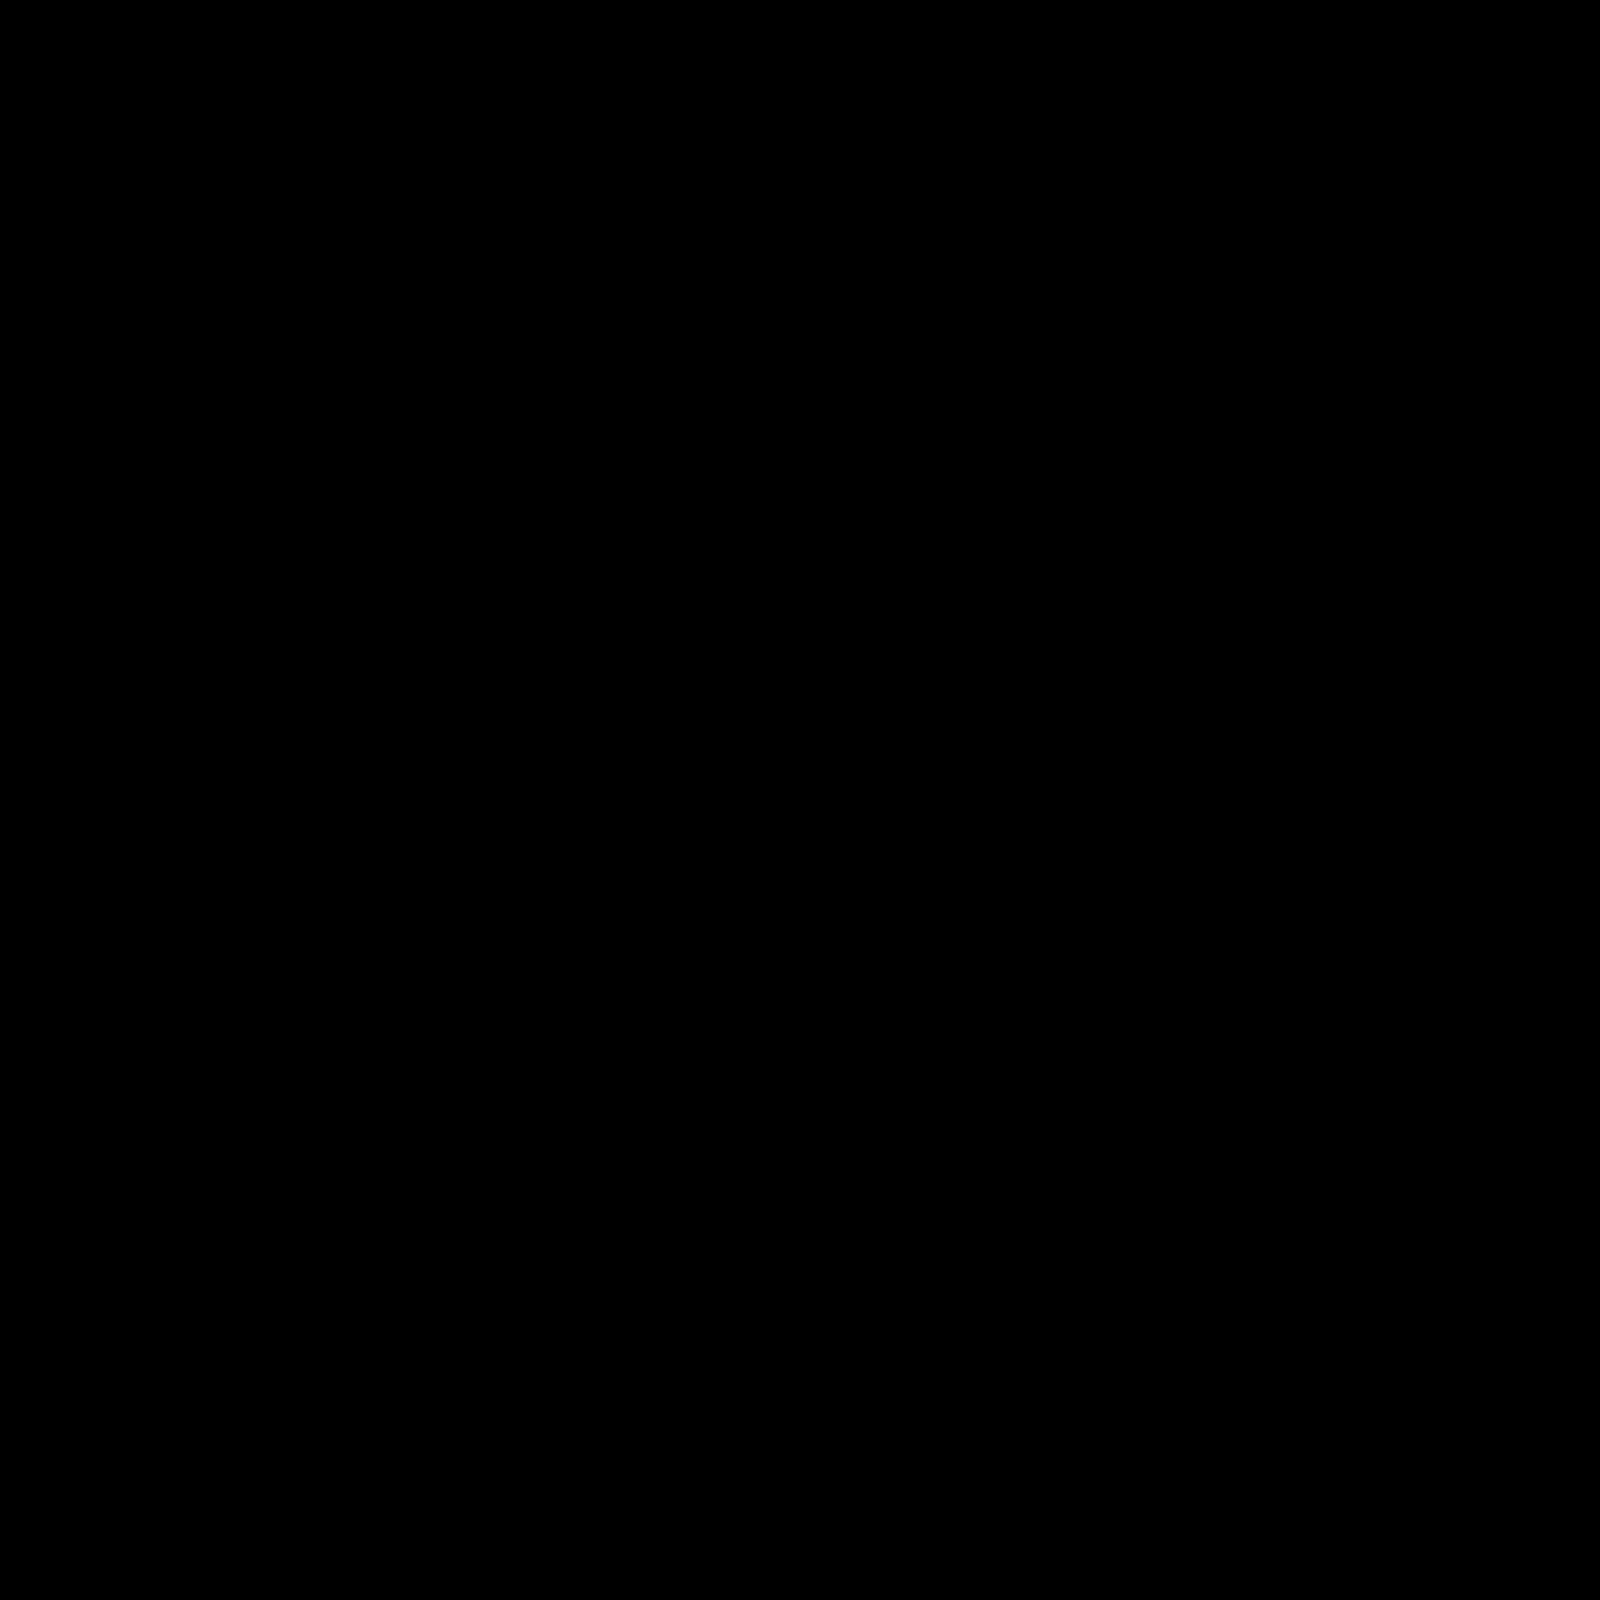 Caixa Protegida icon